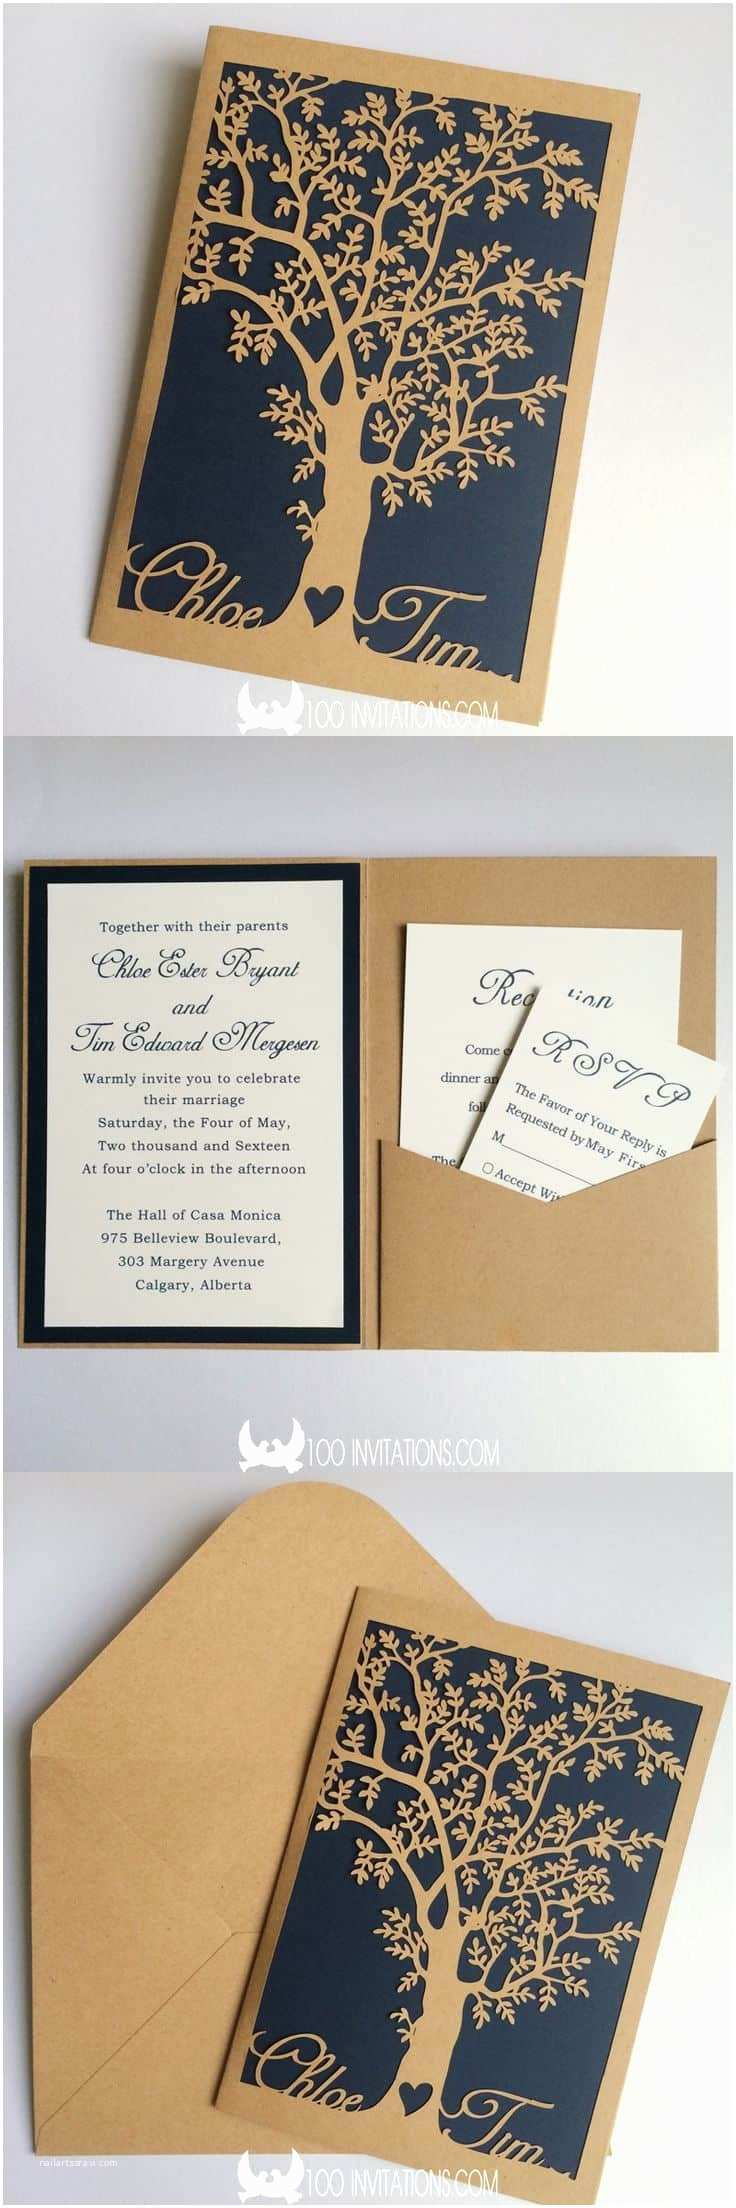 Cricut Wedding Invitations the Cricut Wedding Invitations Designs Ideas